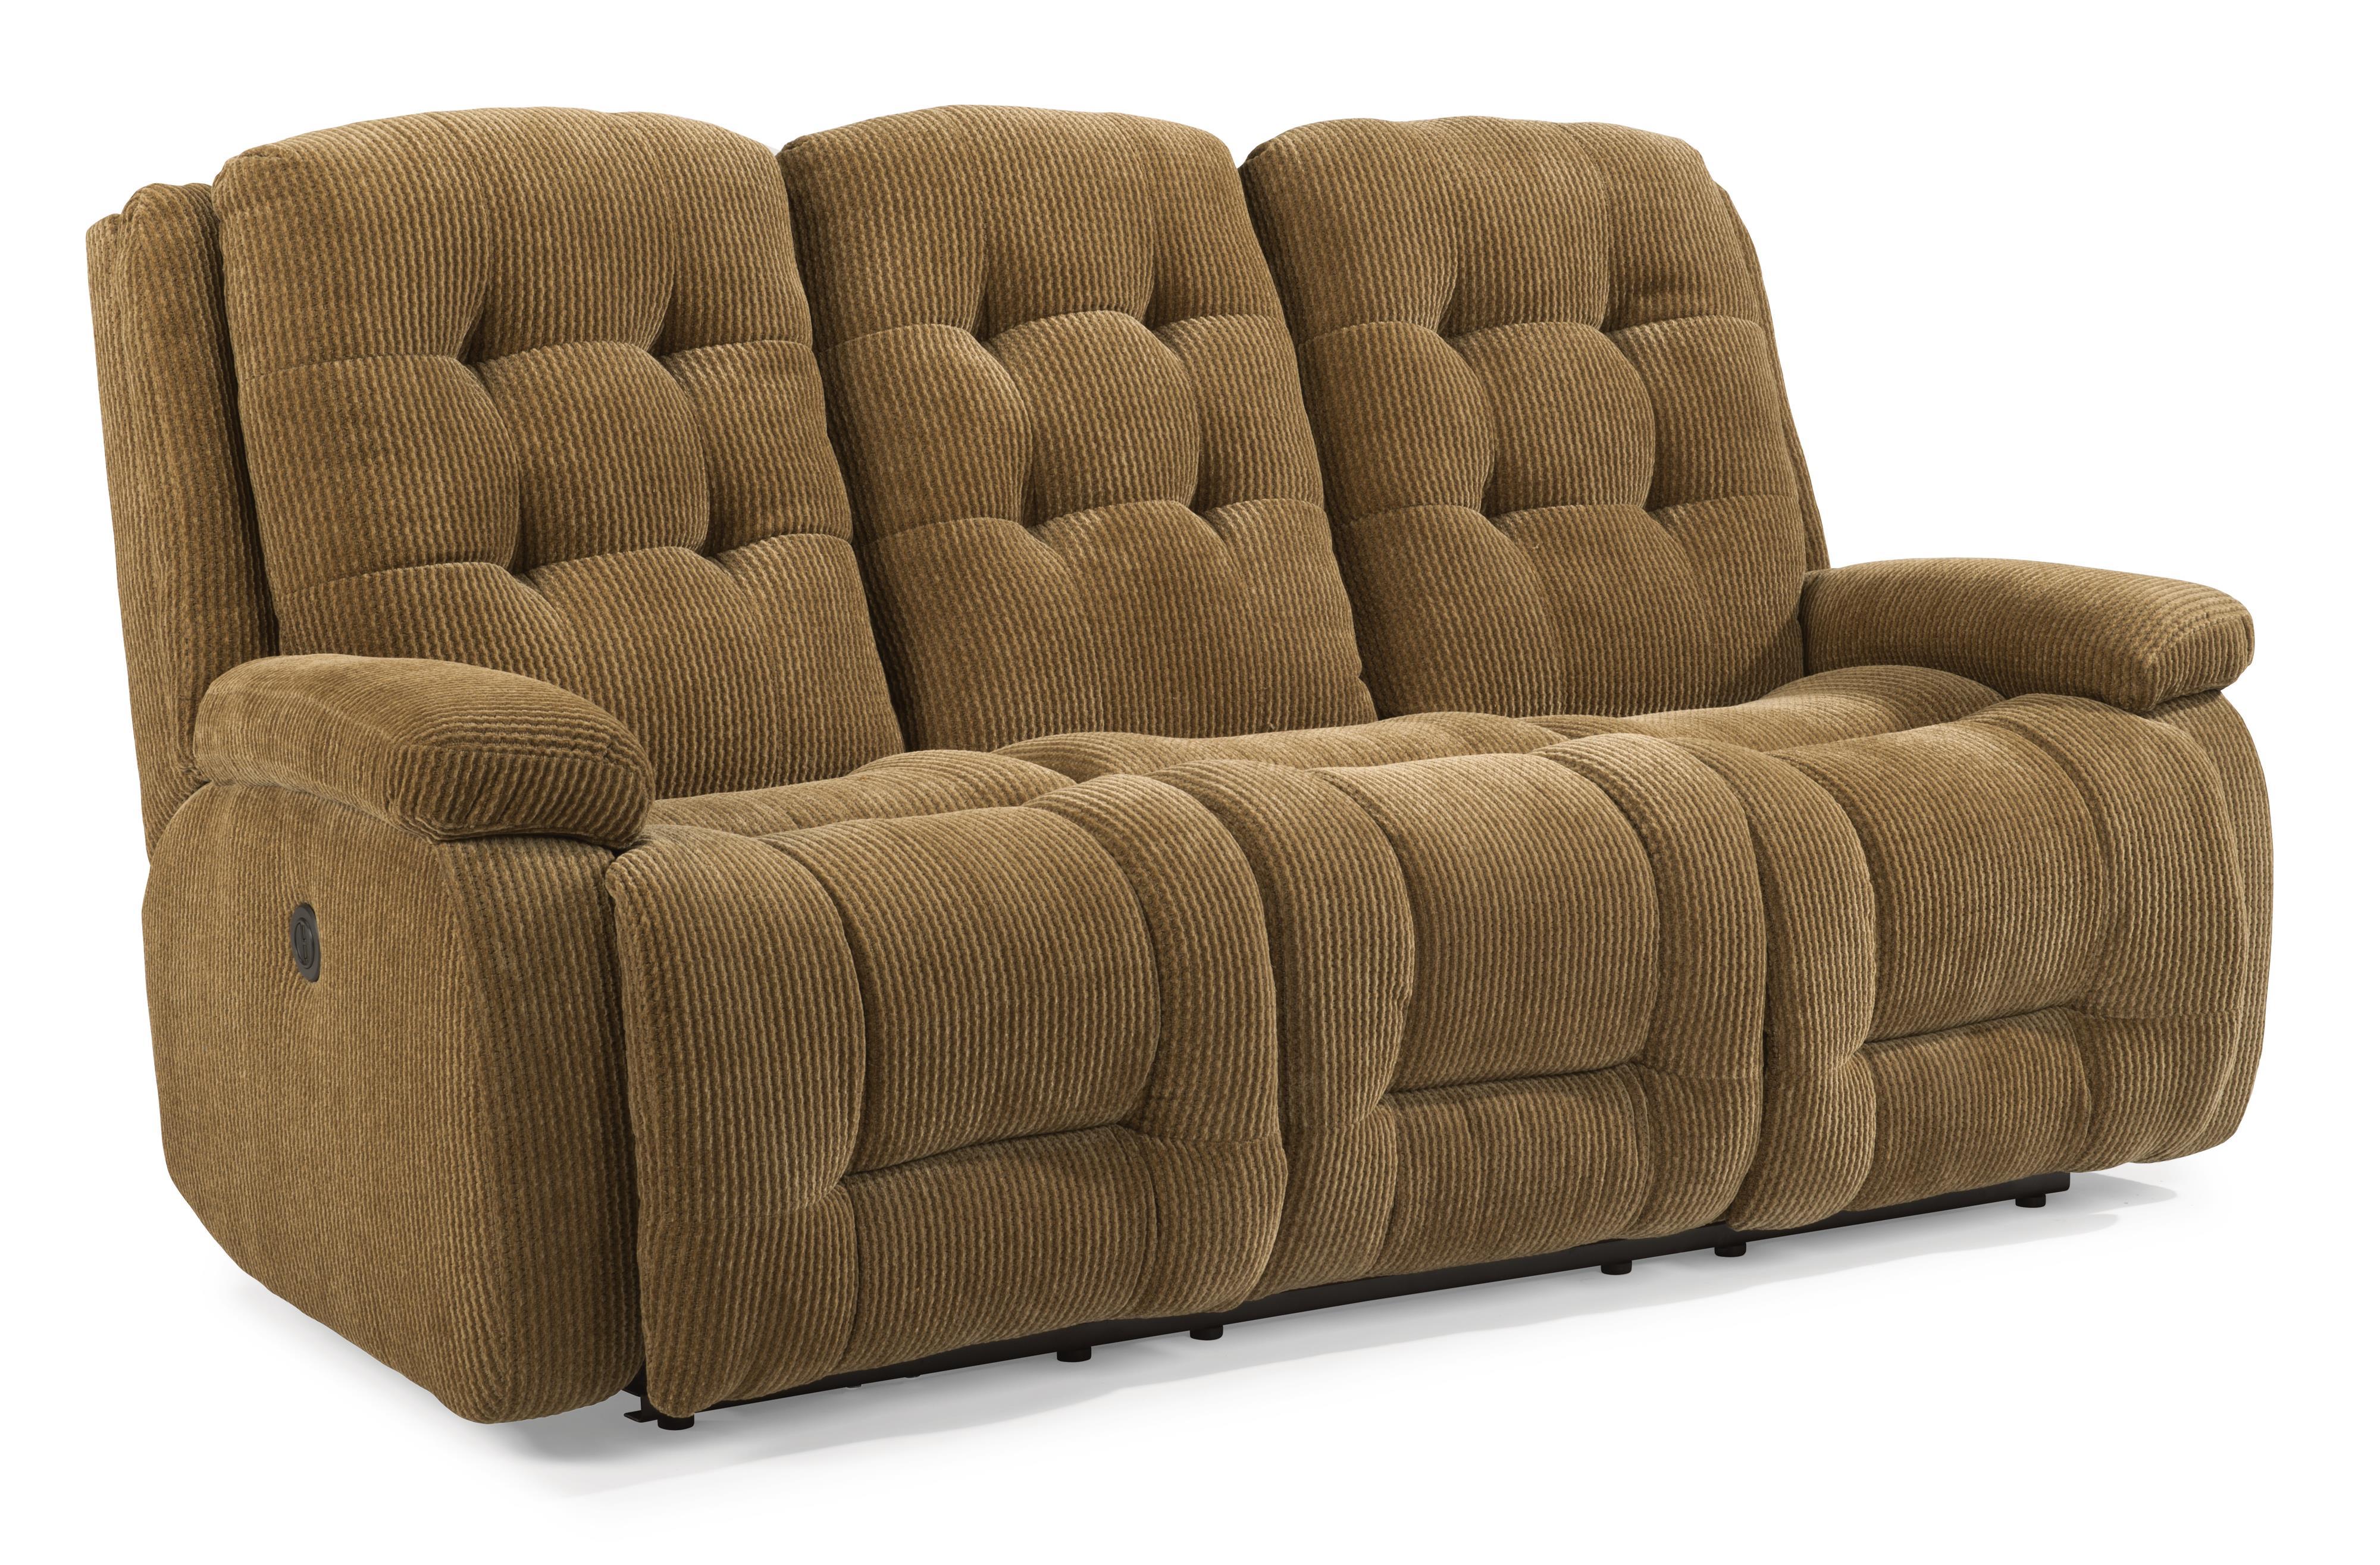 Flexsteel Paxton Power Reclining Sofa - Item Number: 4882-62M-811-90